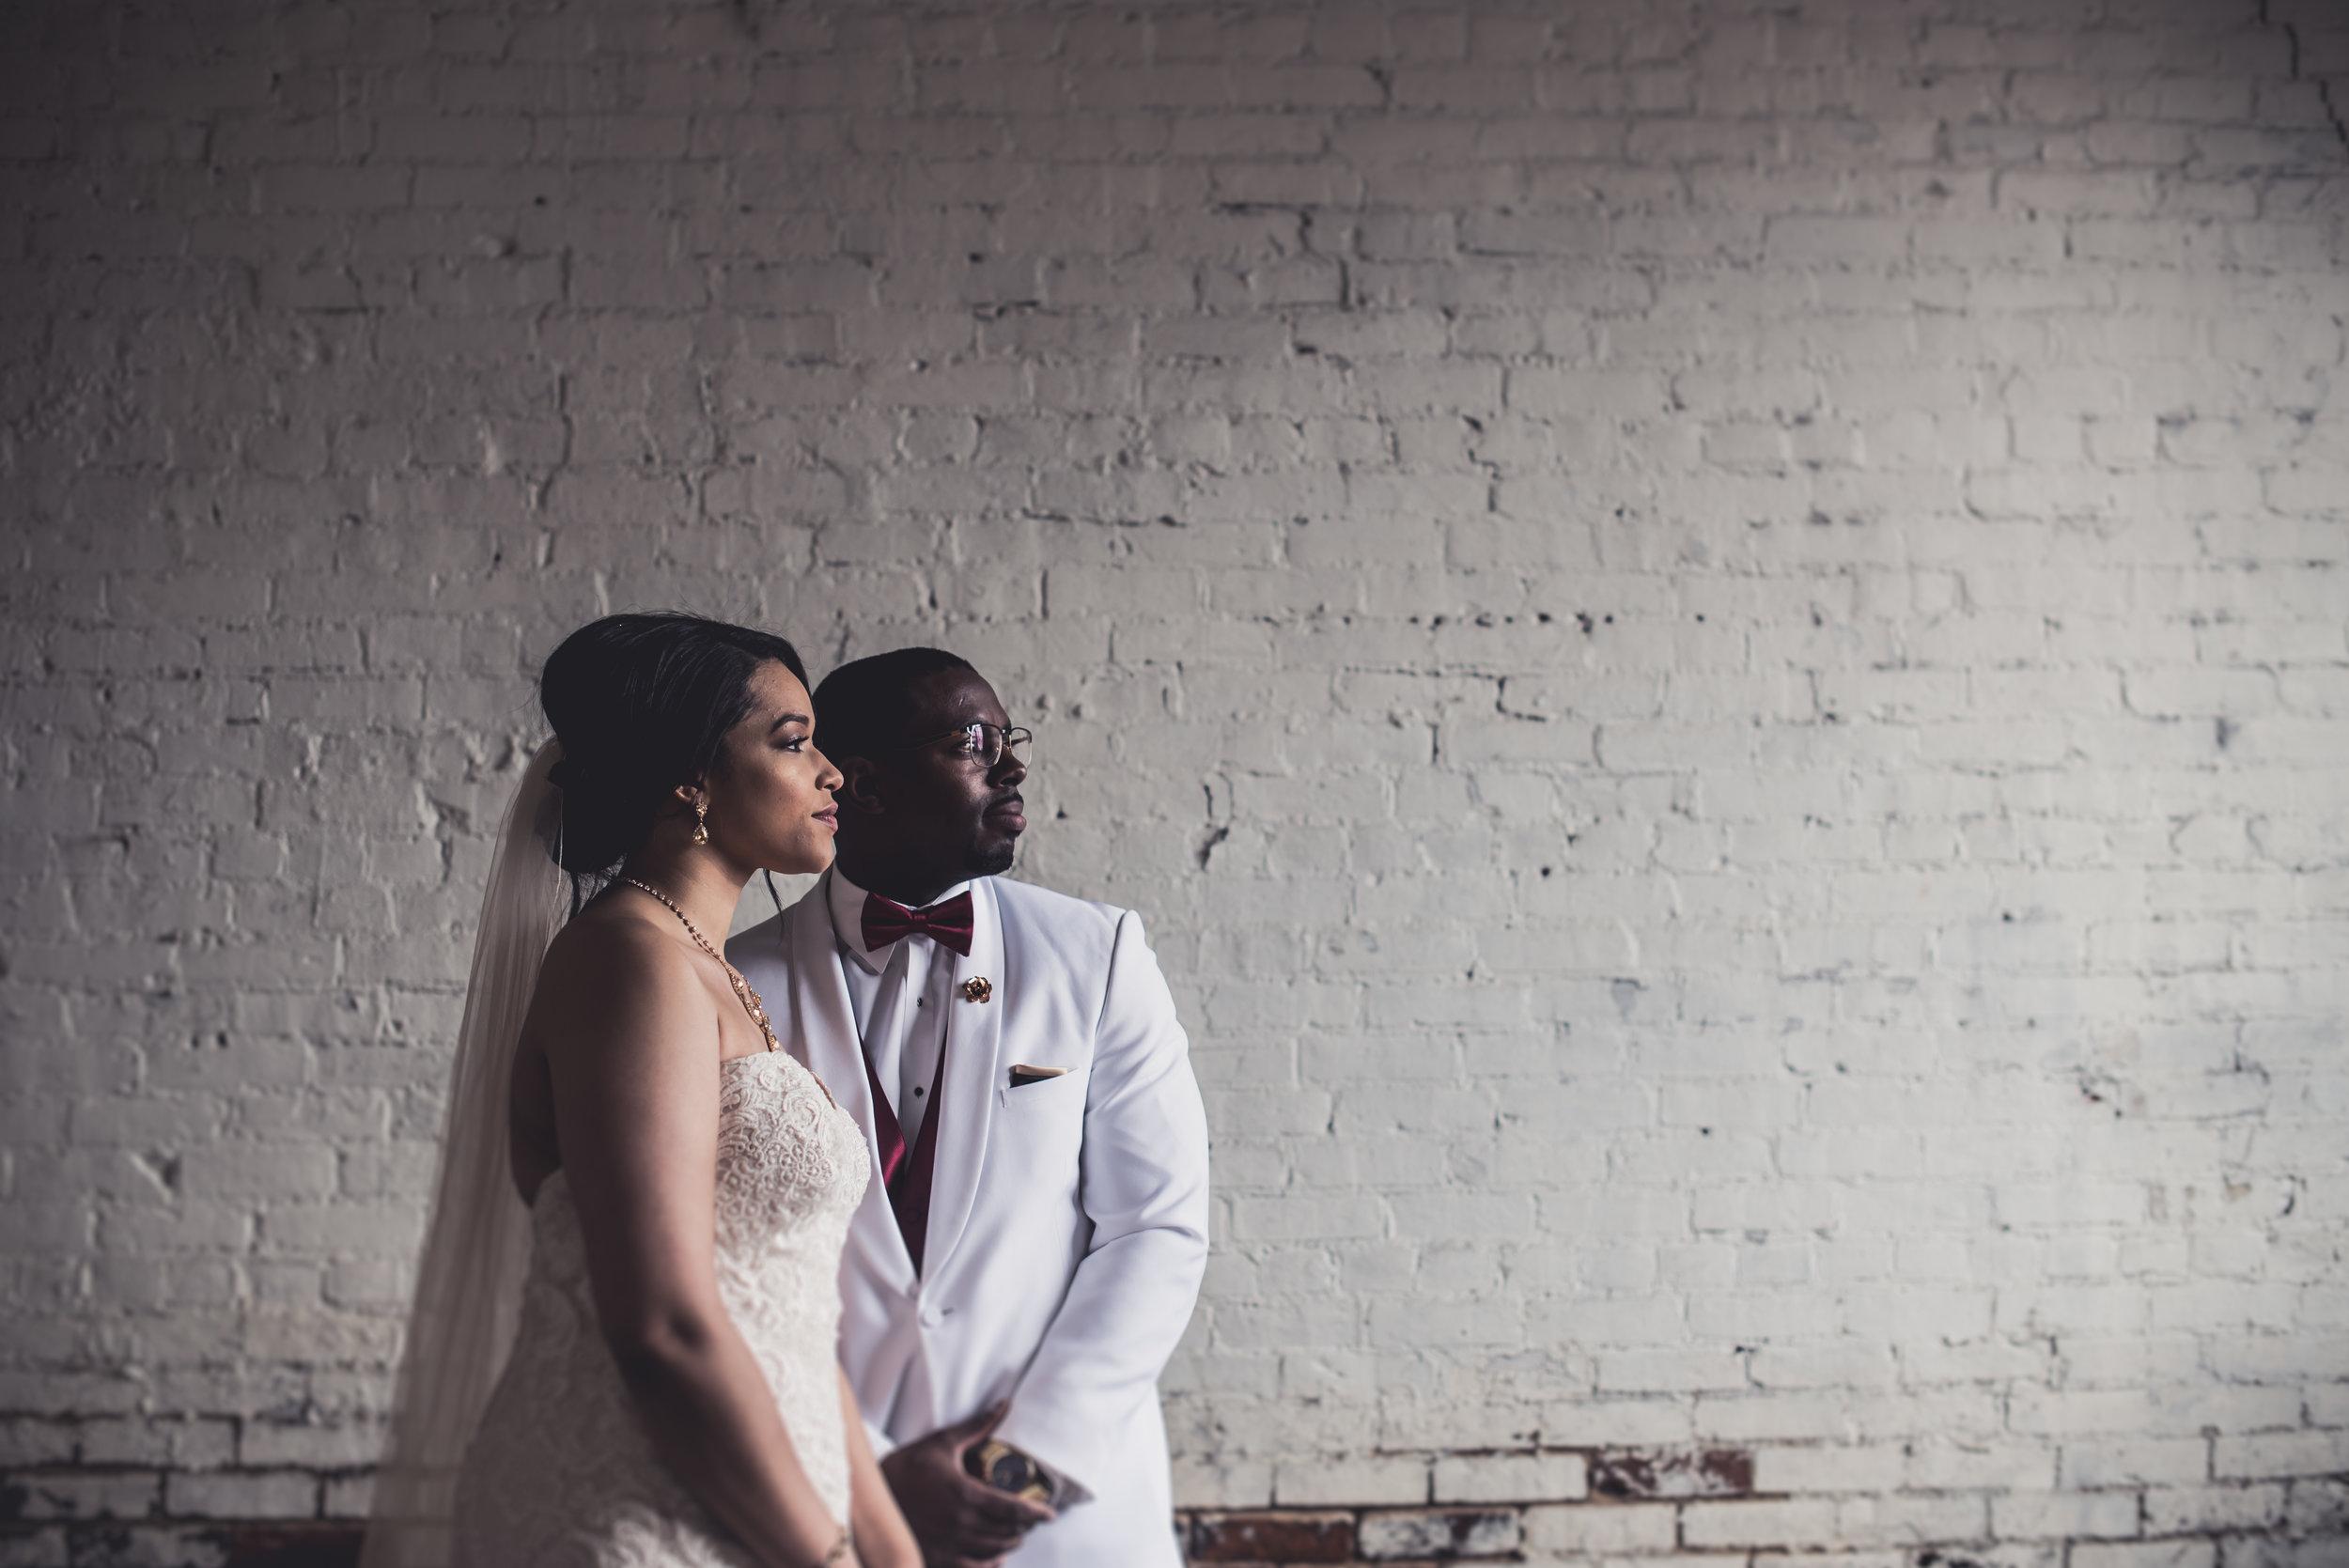 Burlington Iowa Wedding Midwest Photographer Melissa Cervantes _ Chantelle and Isaiah 320ff.jpg